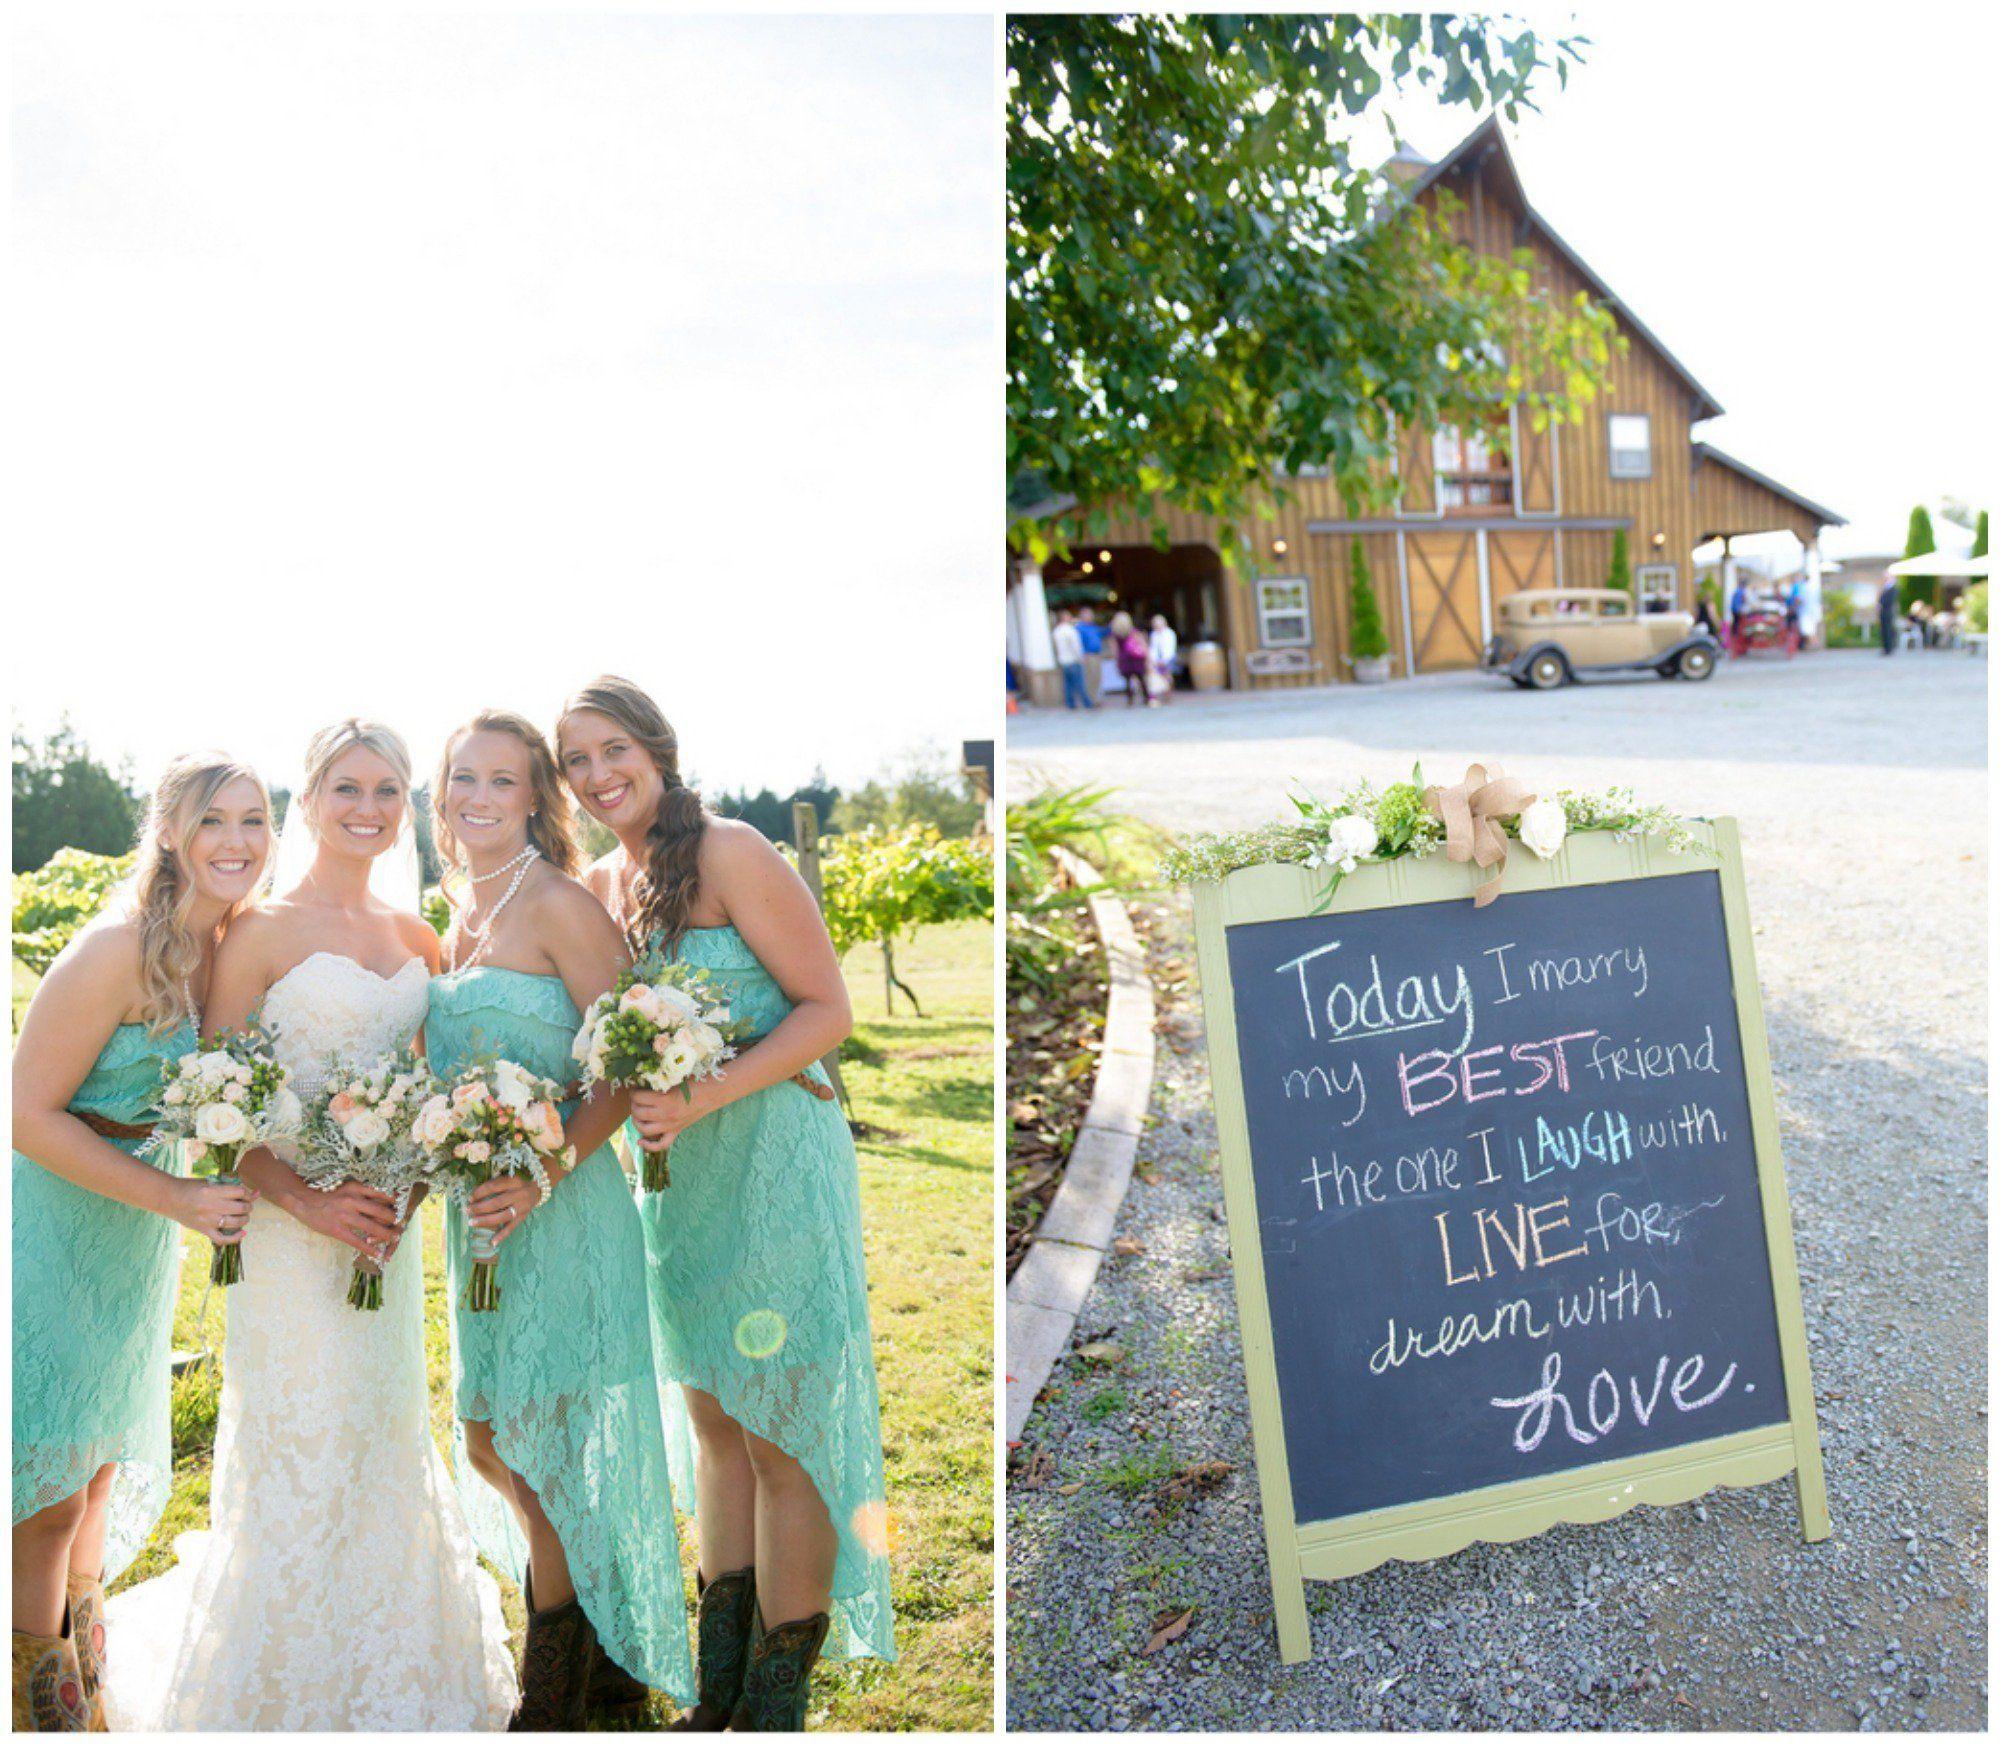 Country Wedding On A Budget | Budgeting, Wedding and Weddings